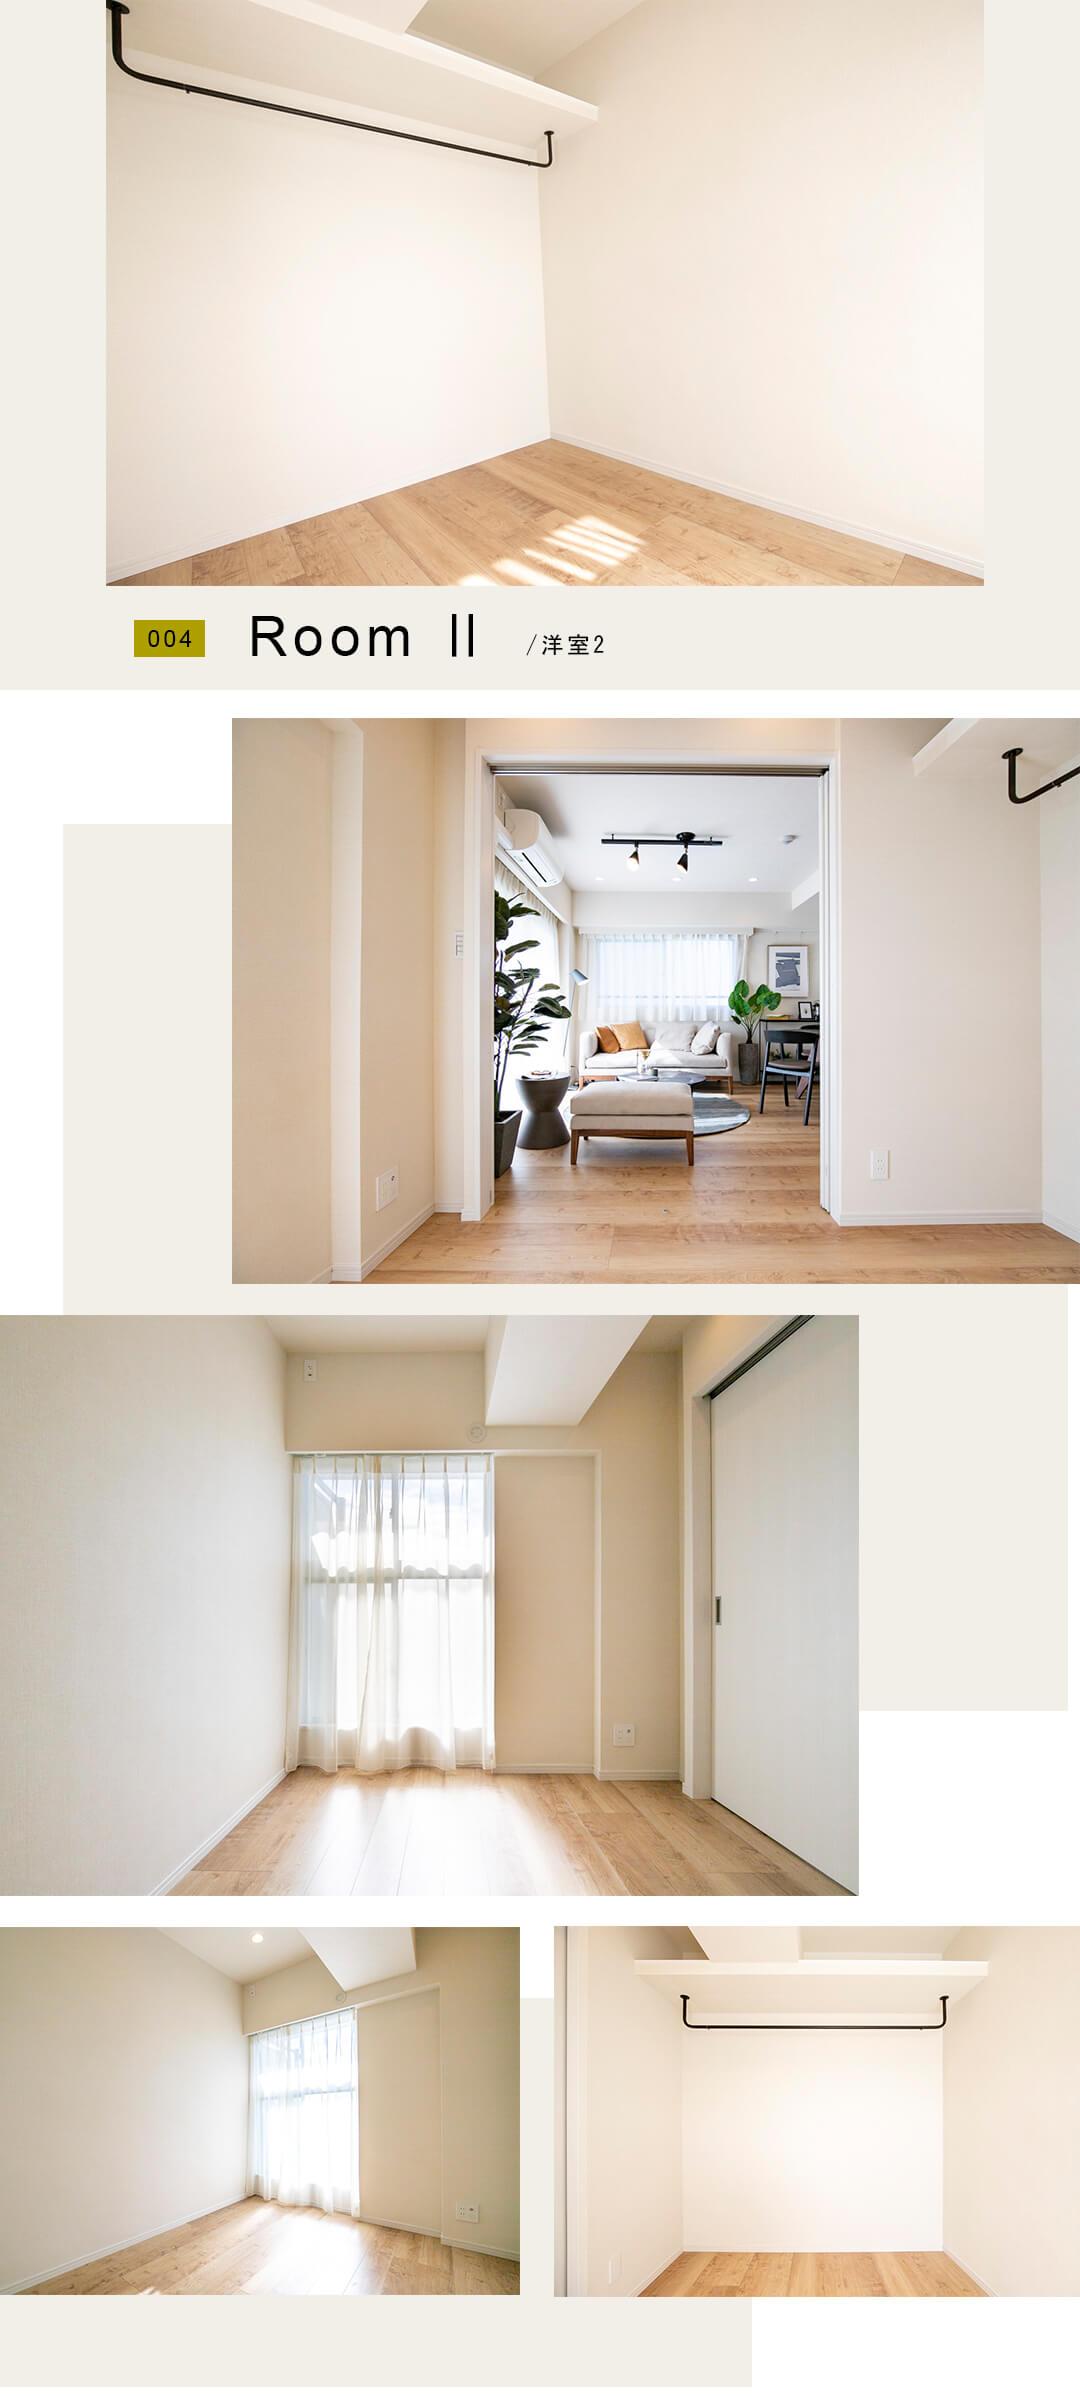 004.RoomⅡ,洋室2